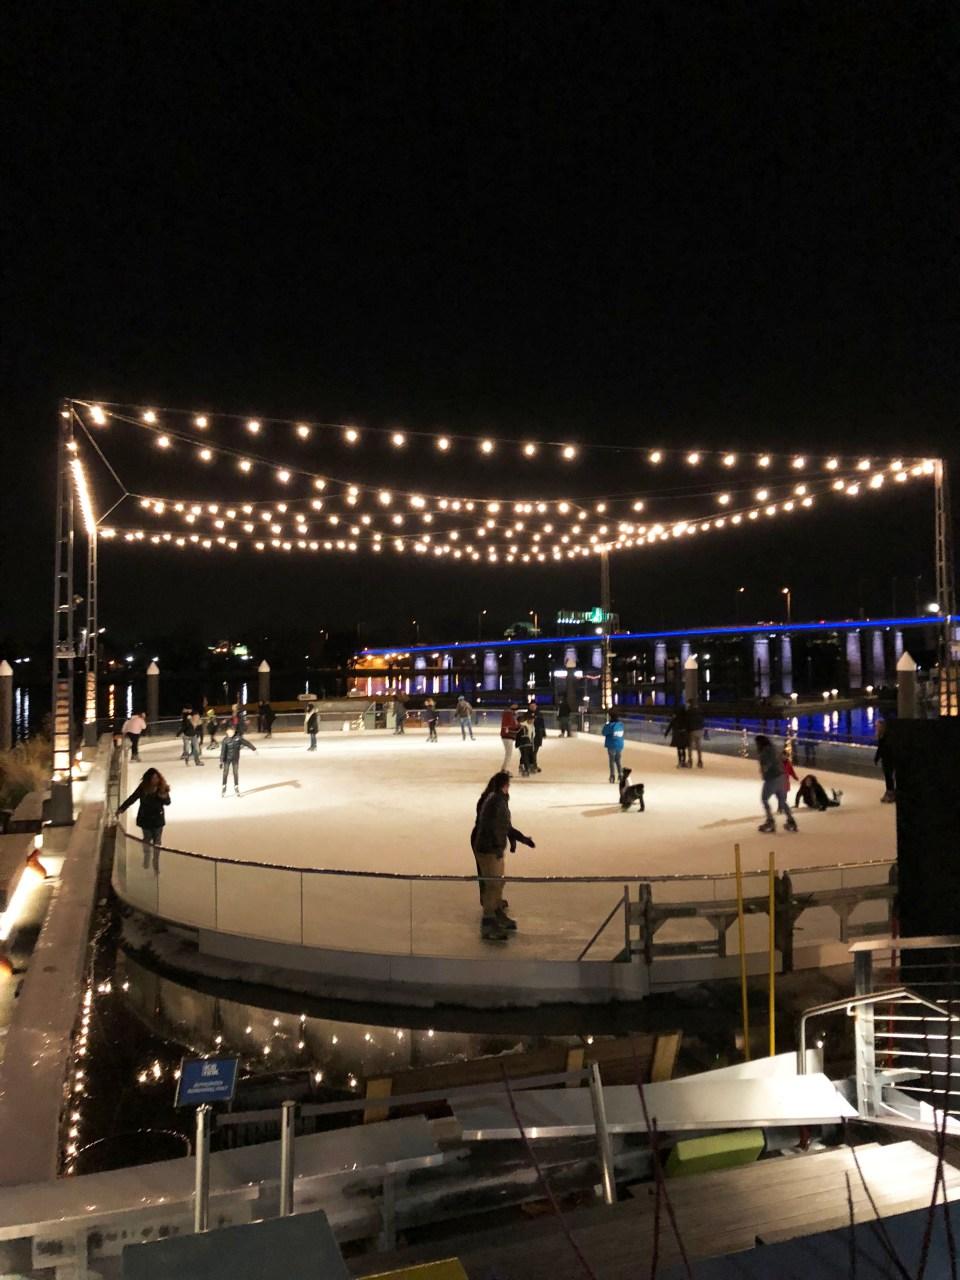 Washington DC Wharf - Ice skating